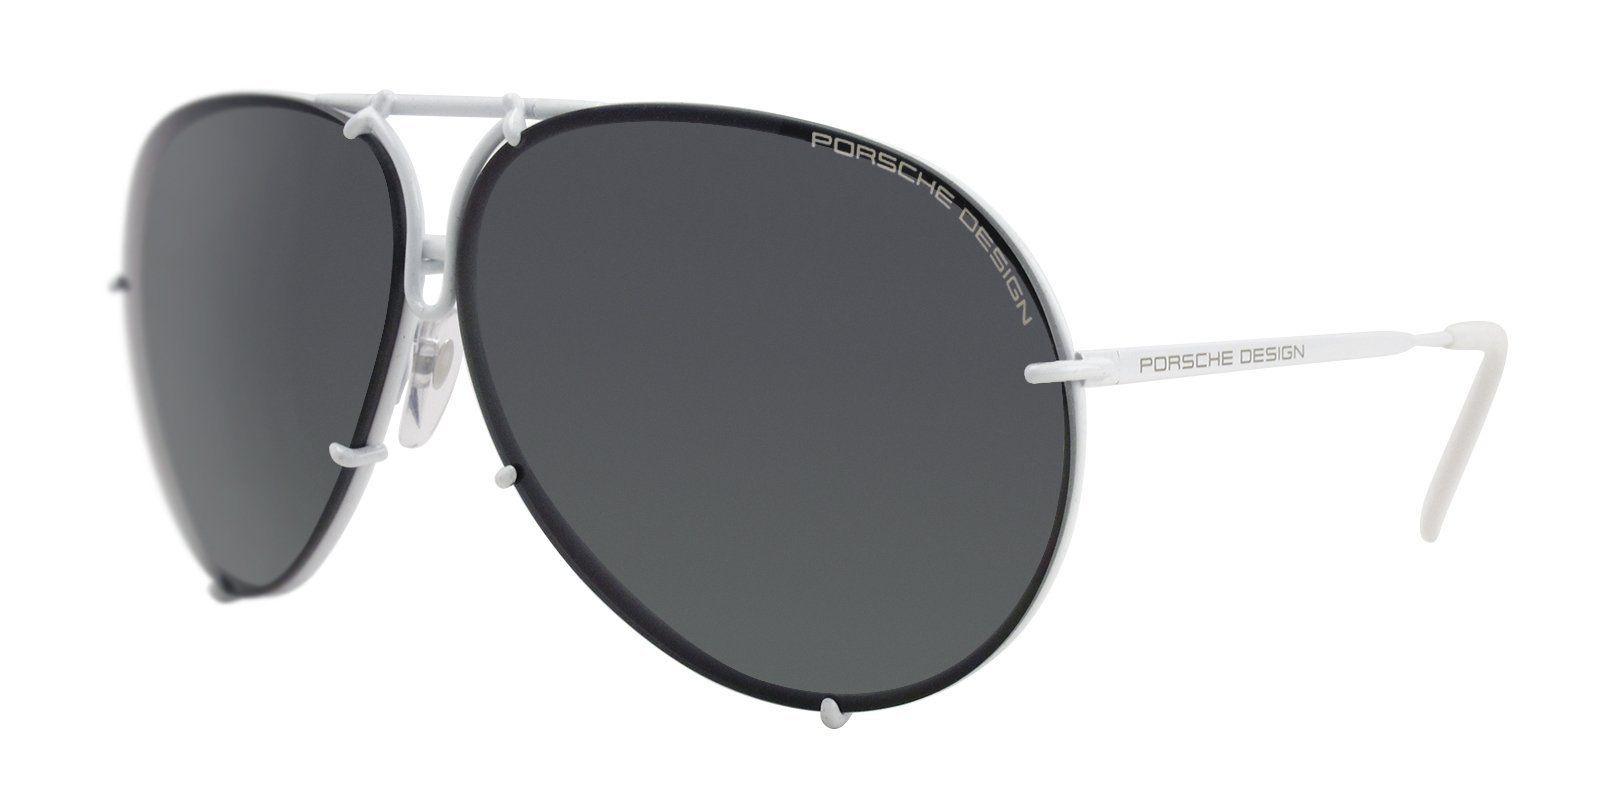 d2bfe3cd2e Porsche Design - P8478 White - Black-sunglasses-Designer Eyes ...